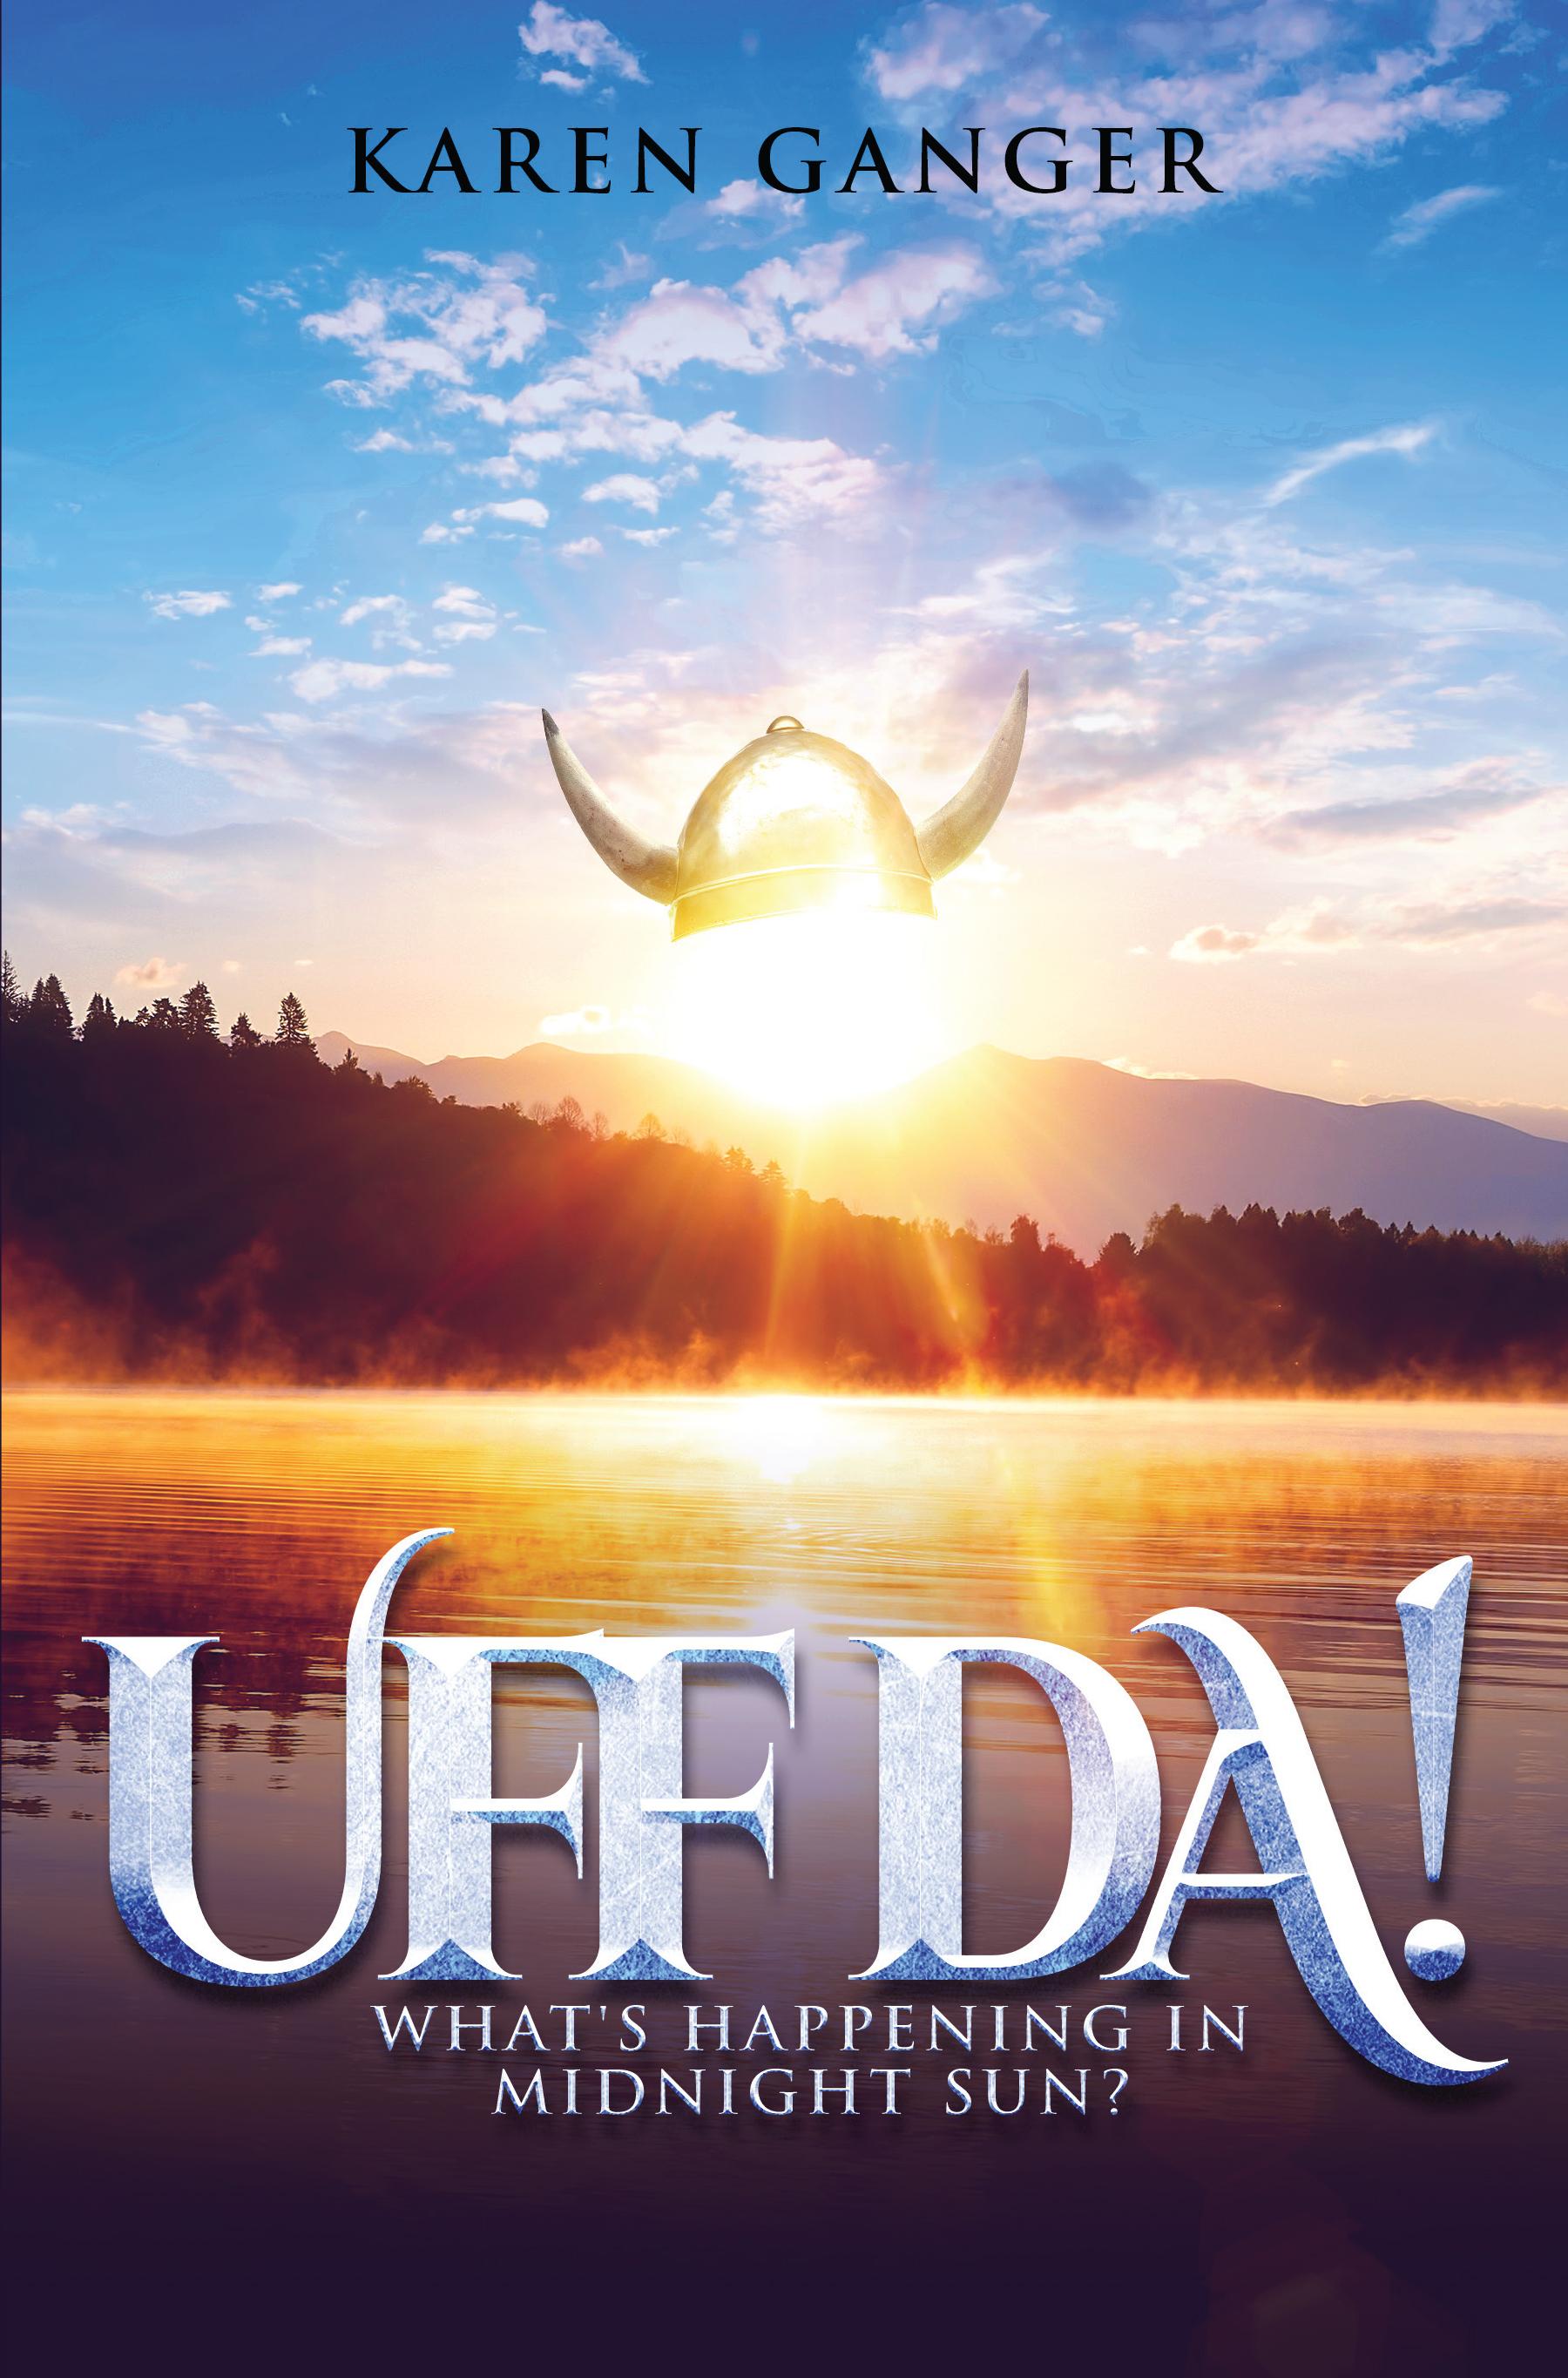 Author Karen Ganger Pens Uff Da! What's Happening in Midnight Sun?